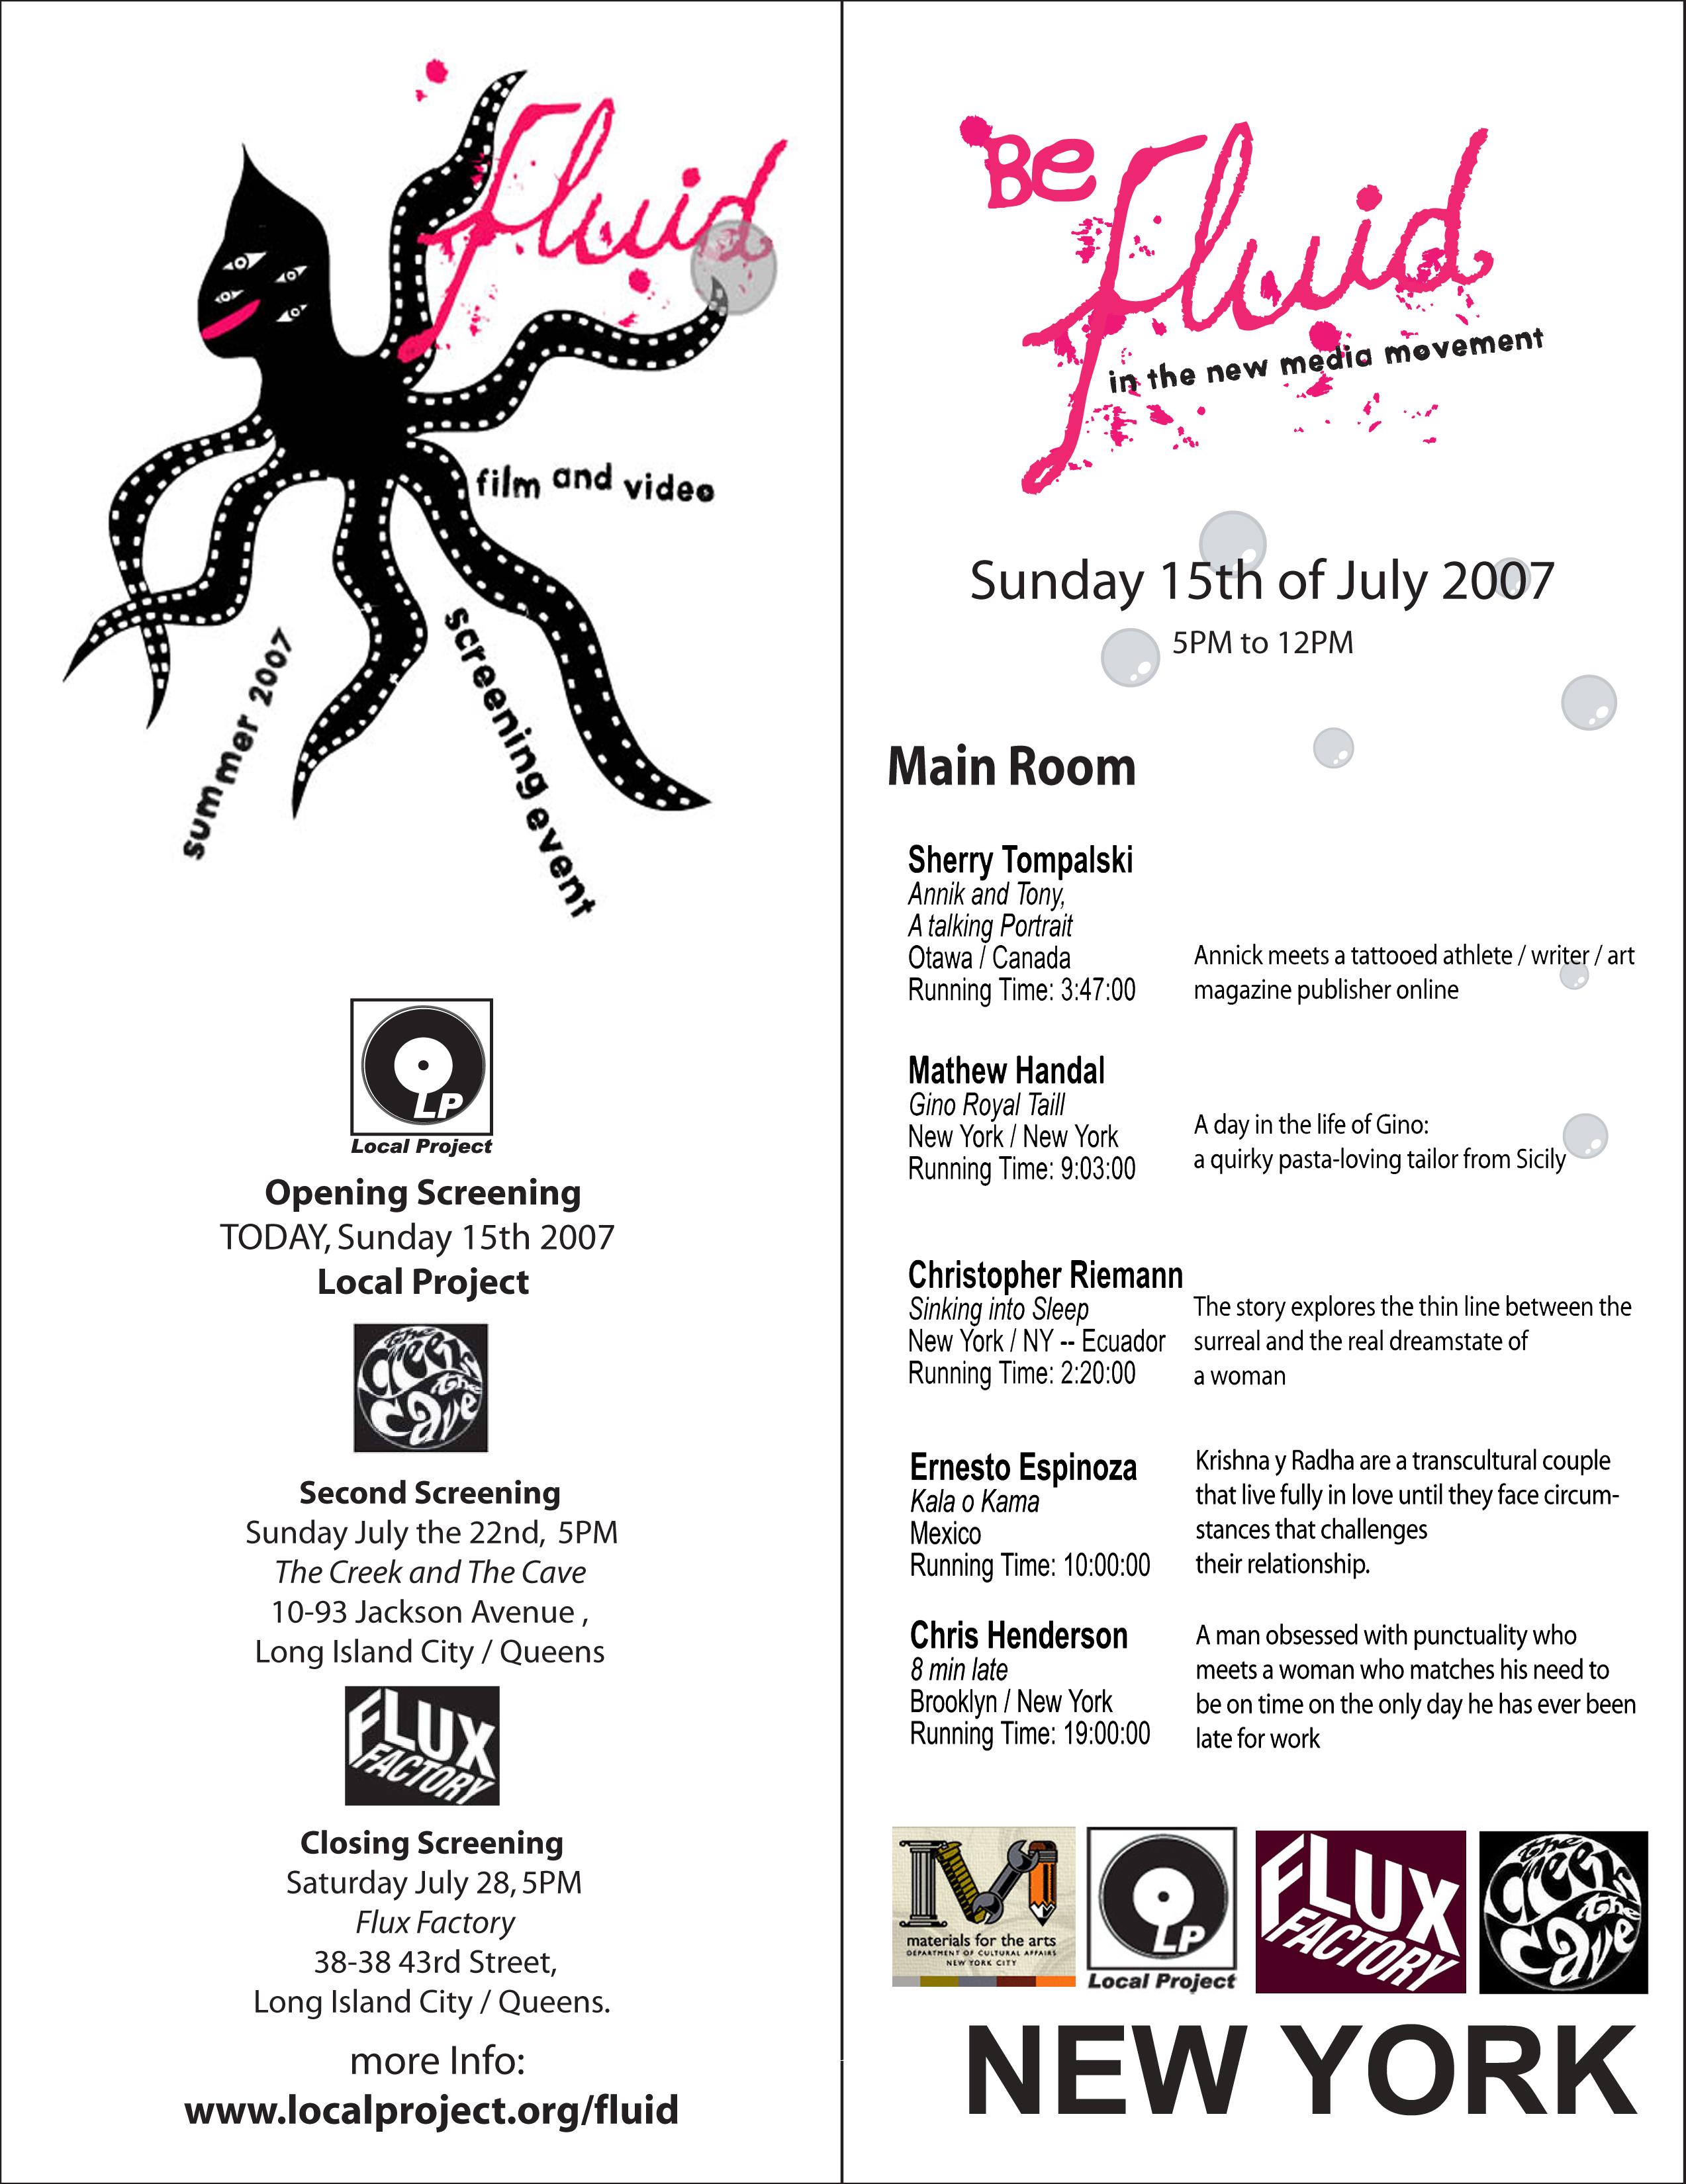 new_york_fluid_-invite-300dpi-8x11-02.jpg